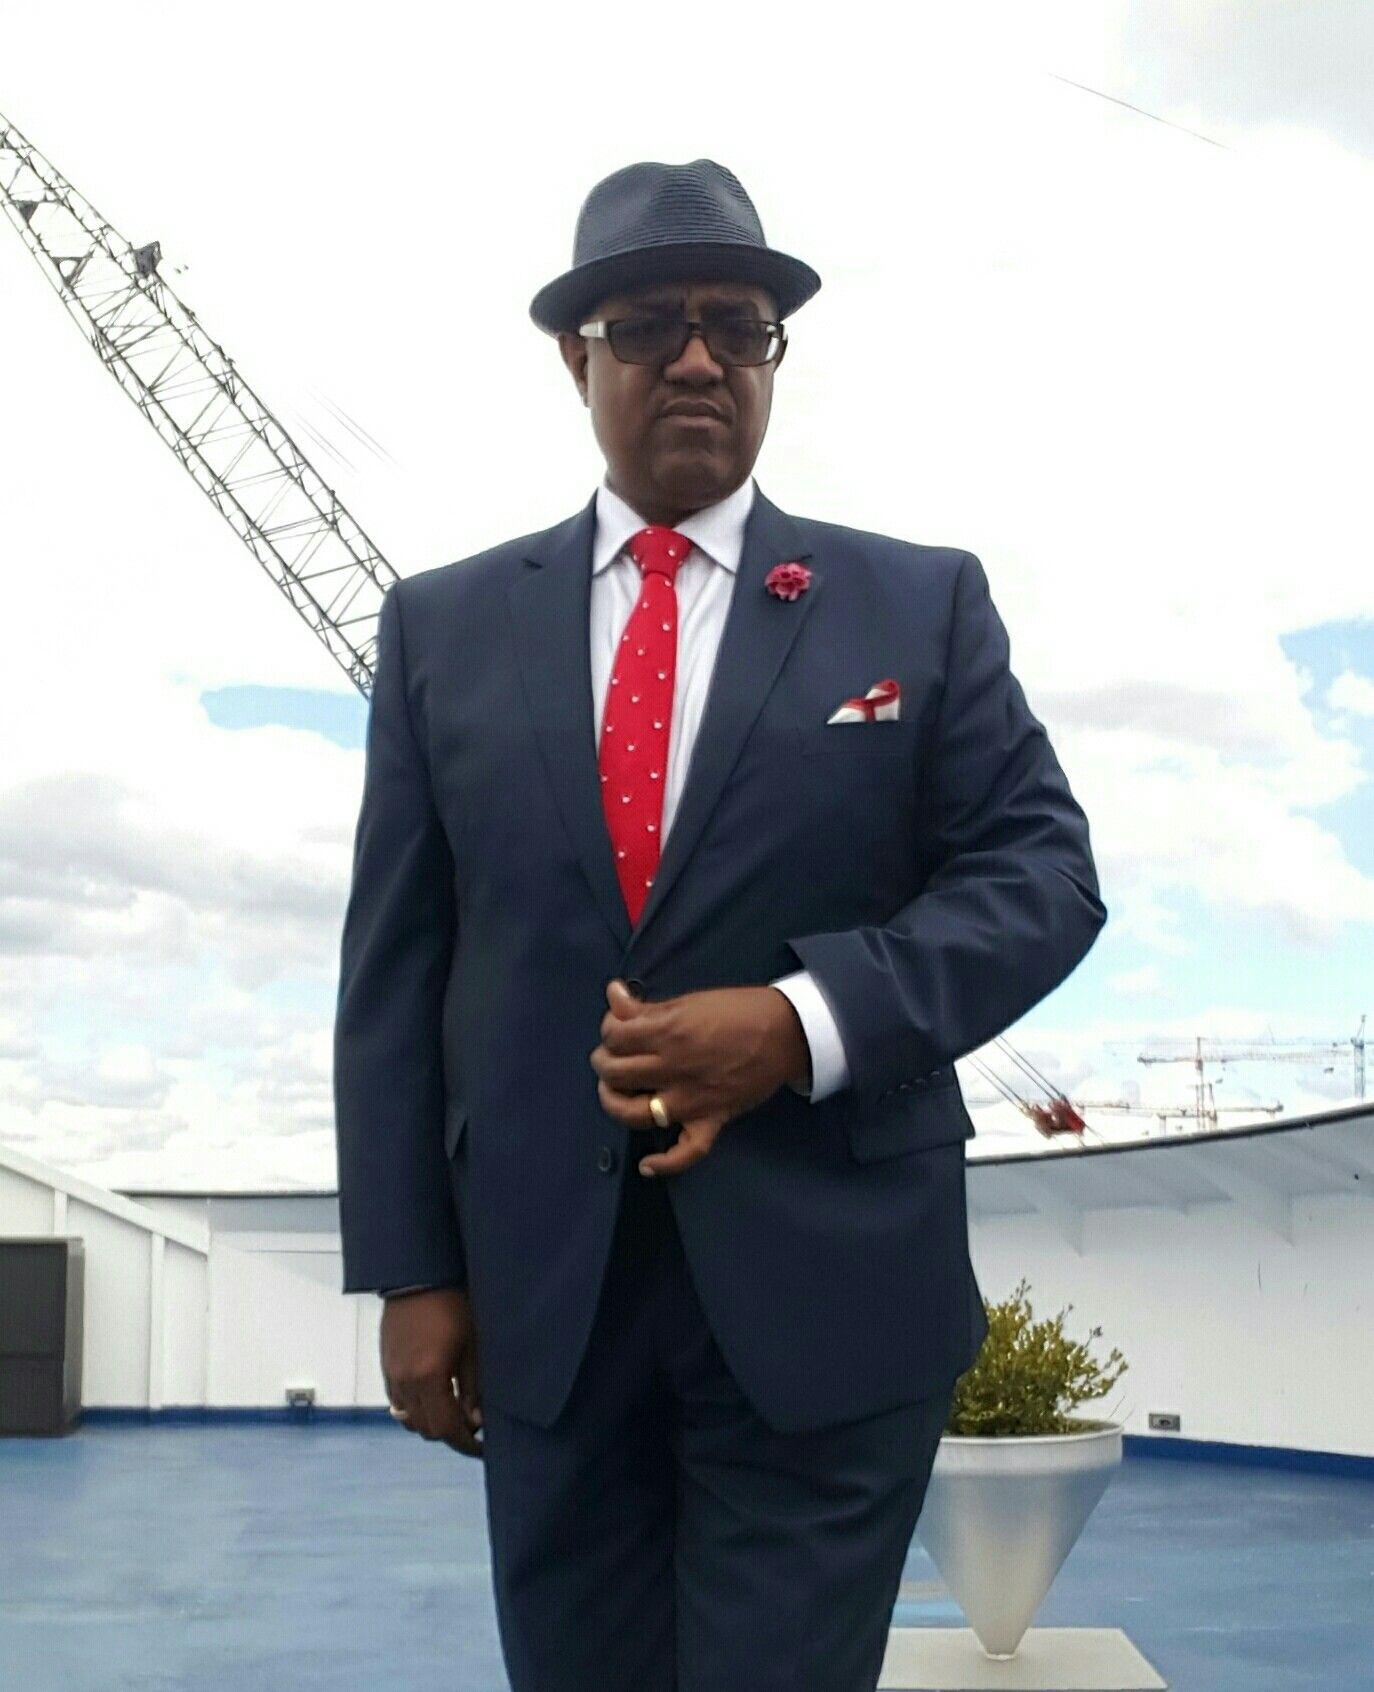 New Blue suit   New blue suit, Blue suit, Suits